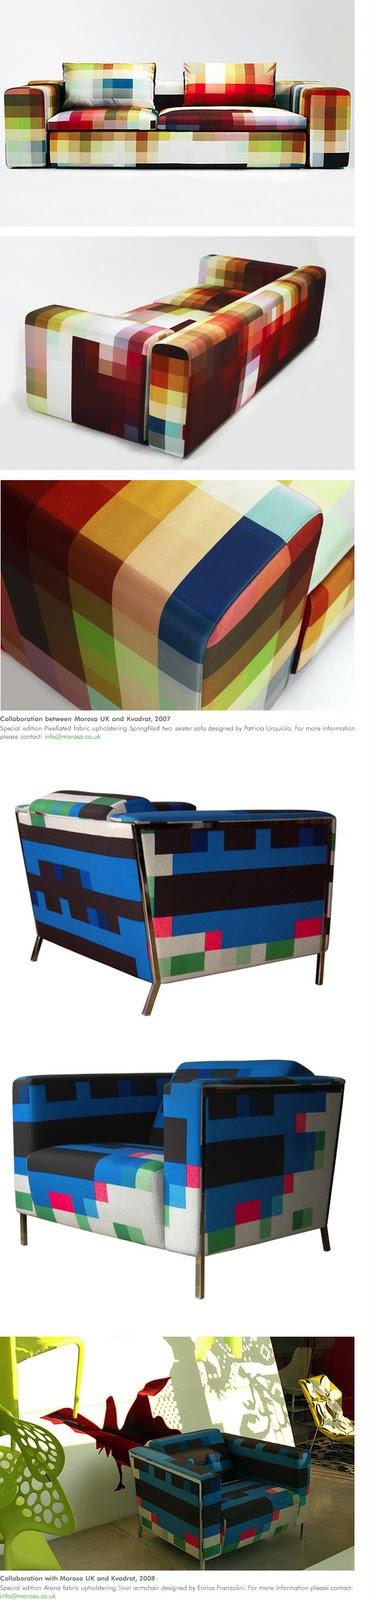 Cupboards Kitchen And Bath 8 Bit Furniture